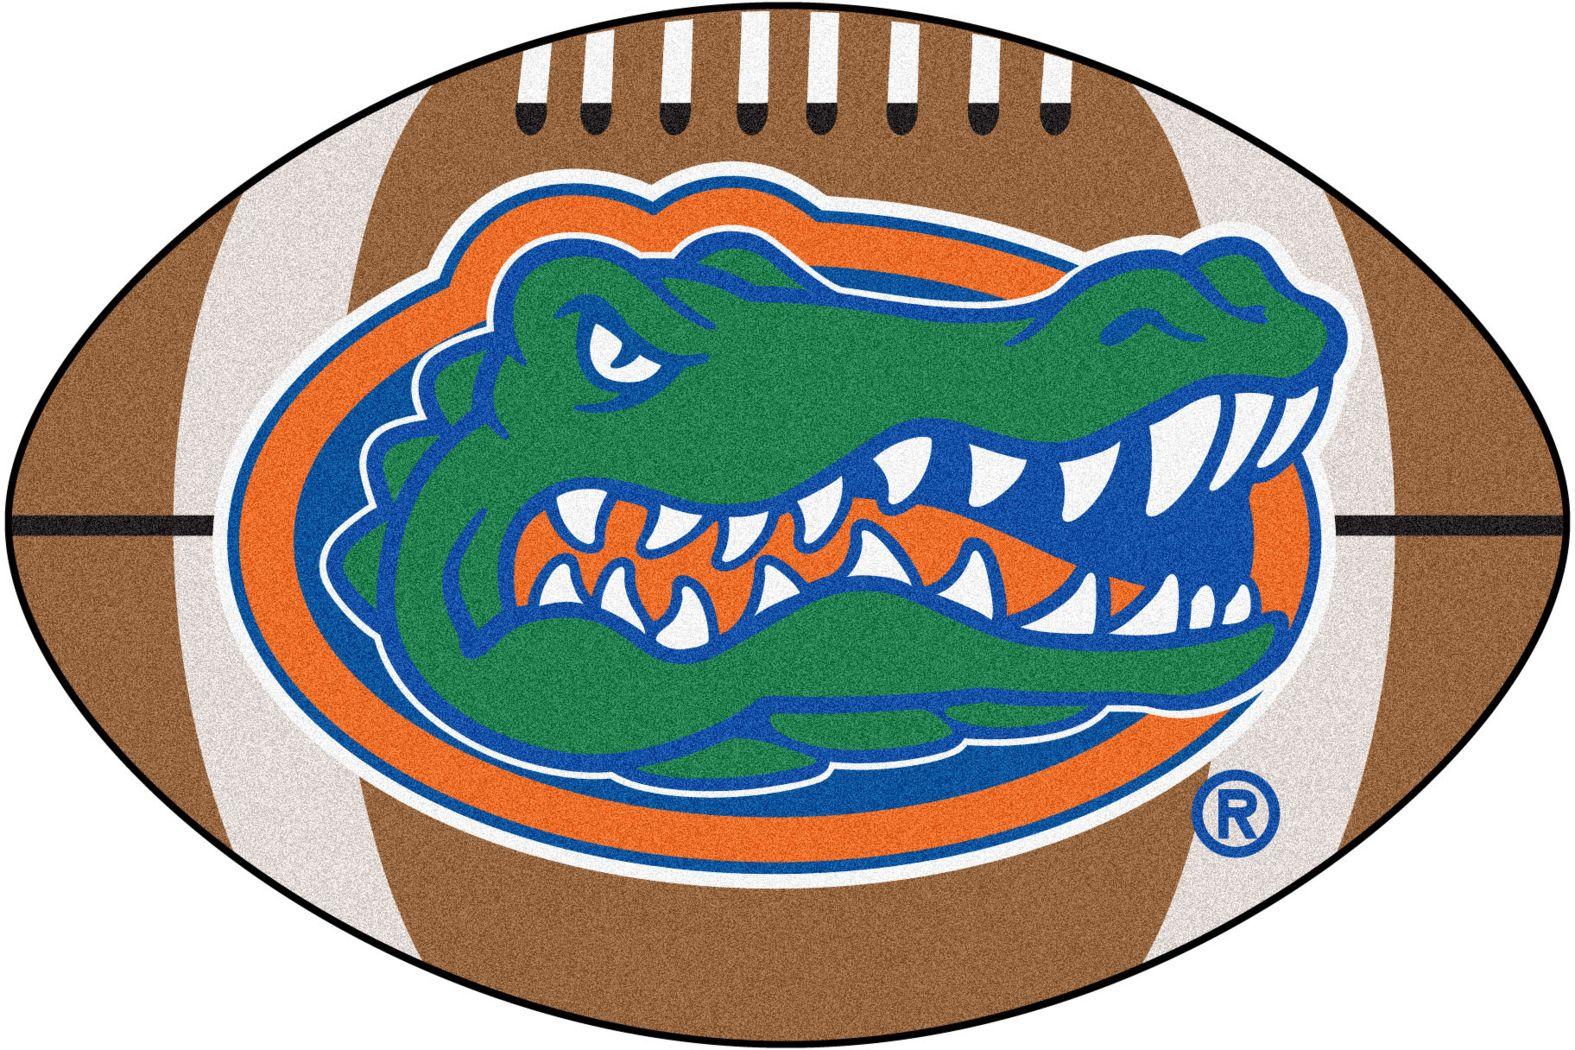 "NCAA Football Mascot University of Florida 1'6"" x 1'10"" Rug"